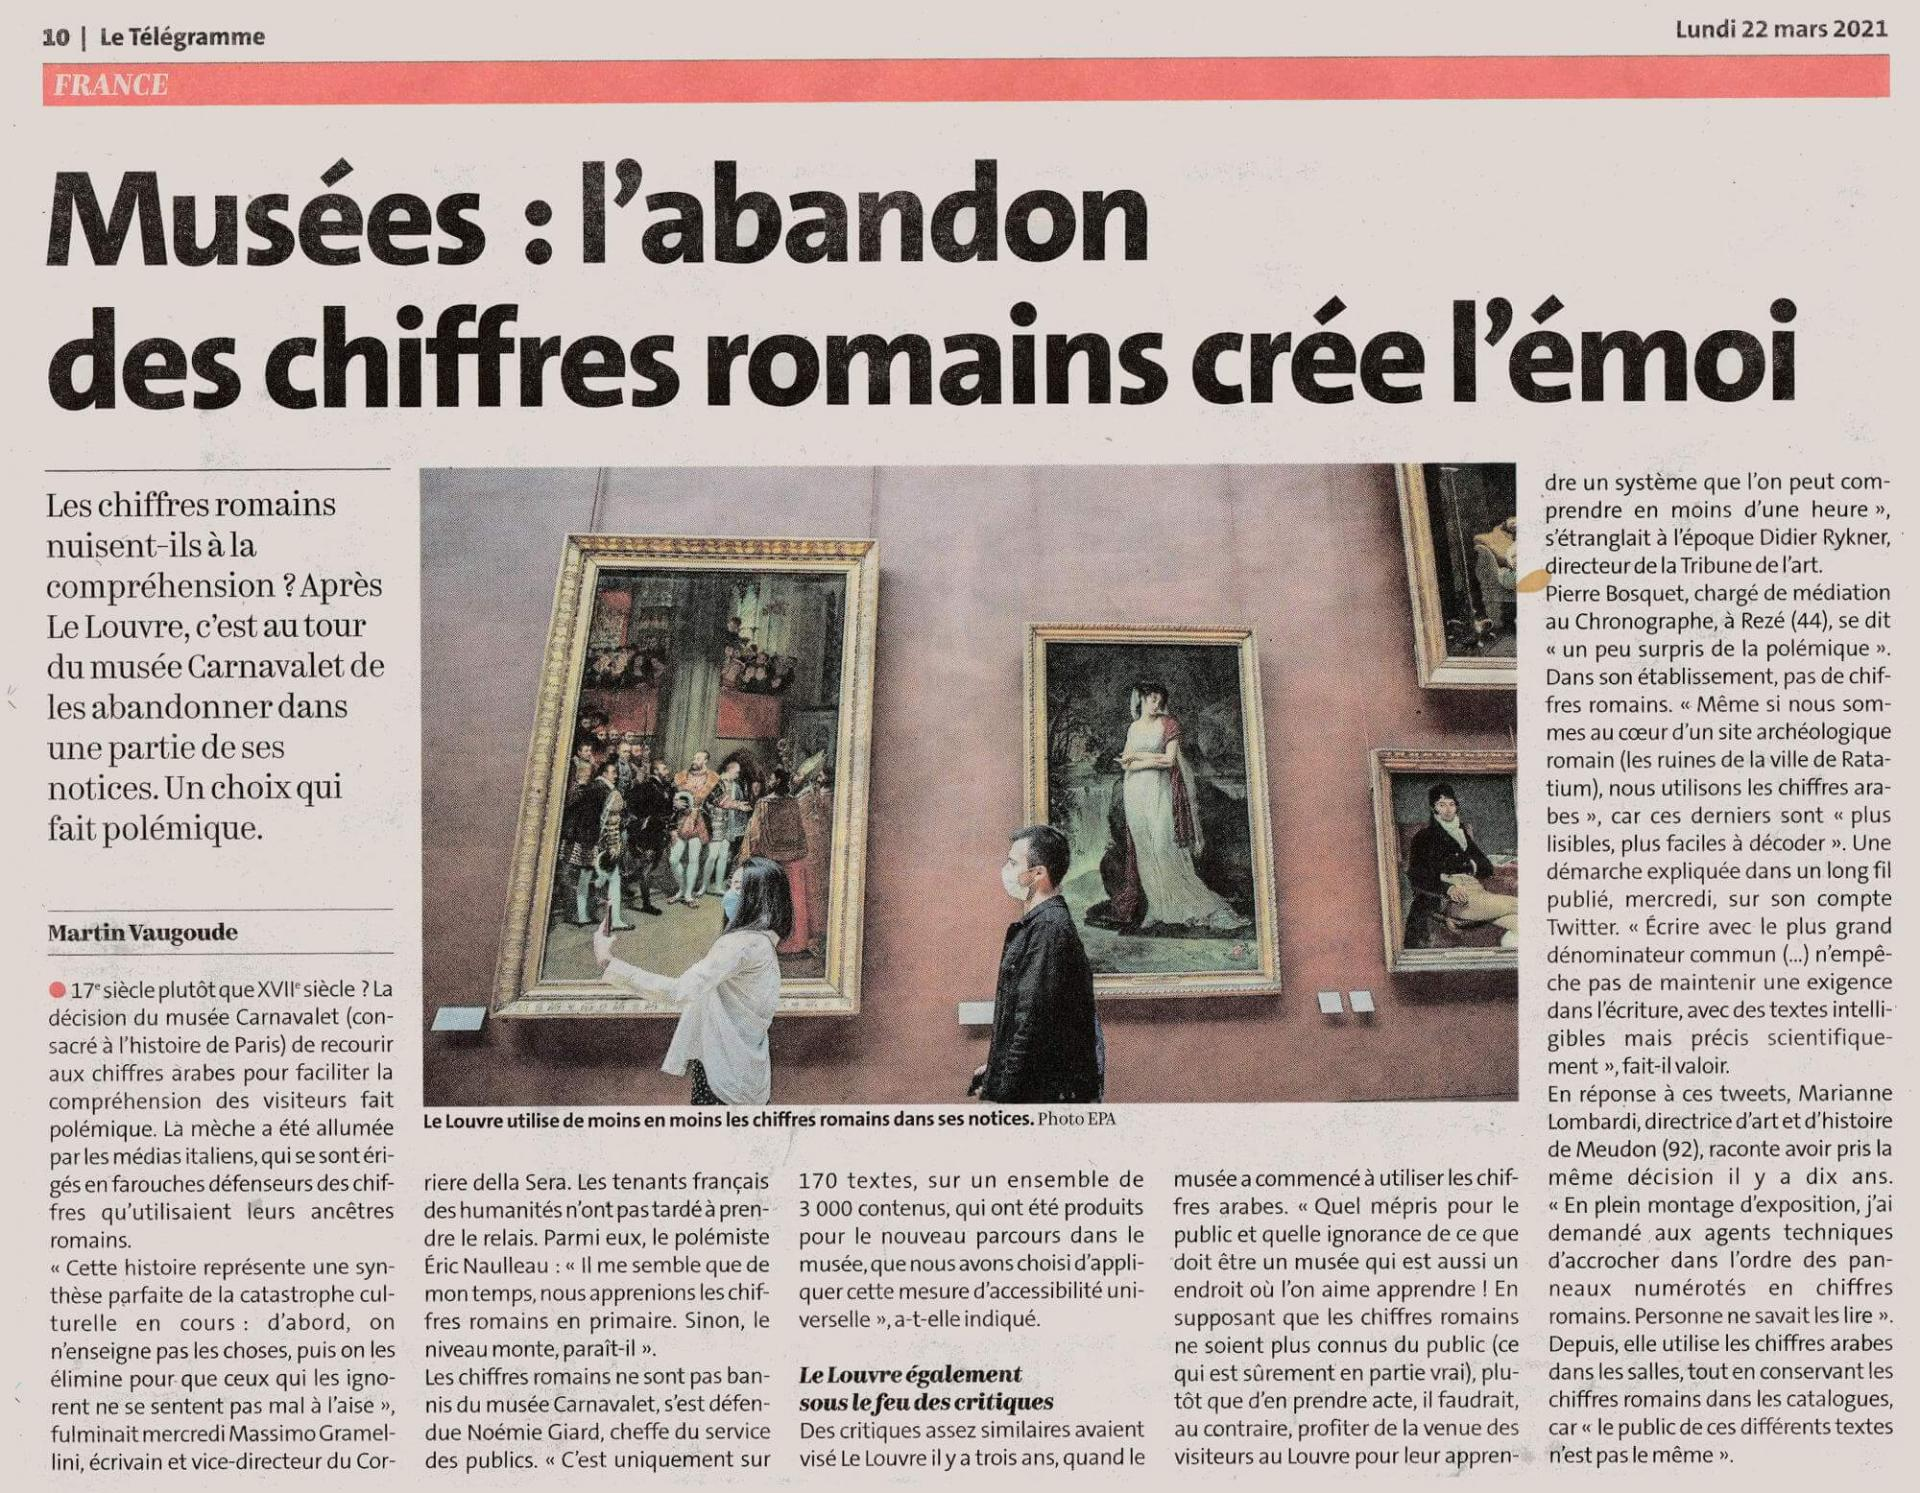 Chiffres romains